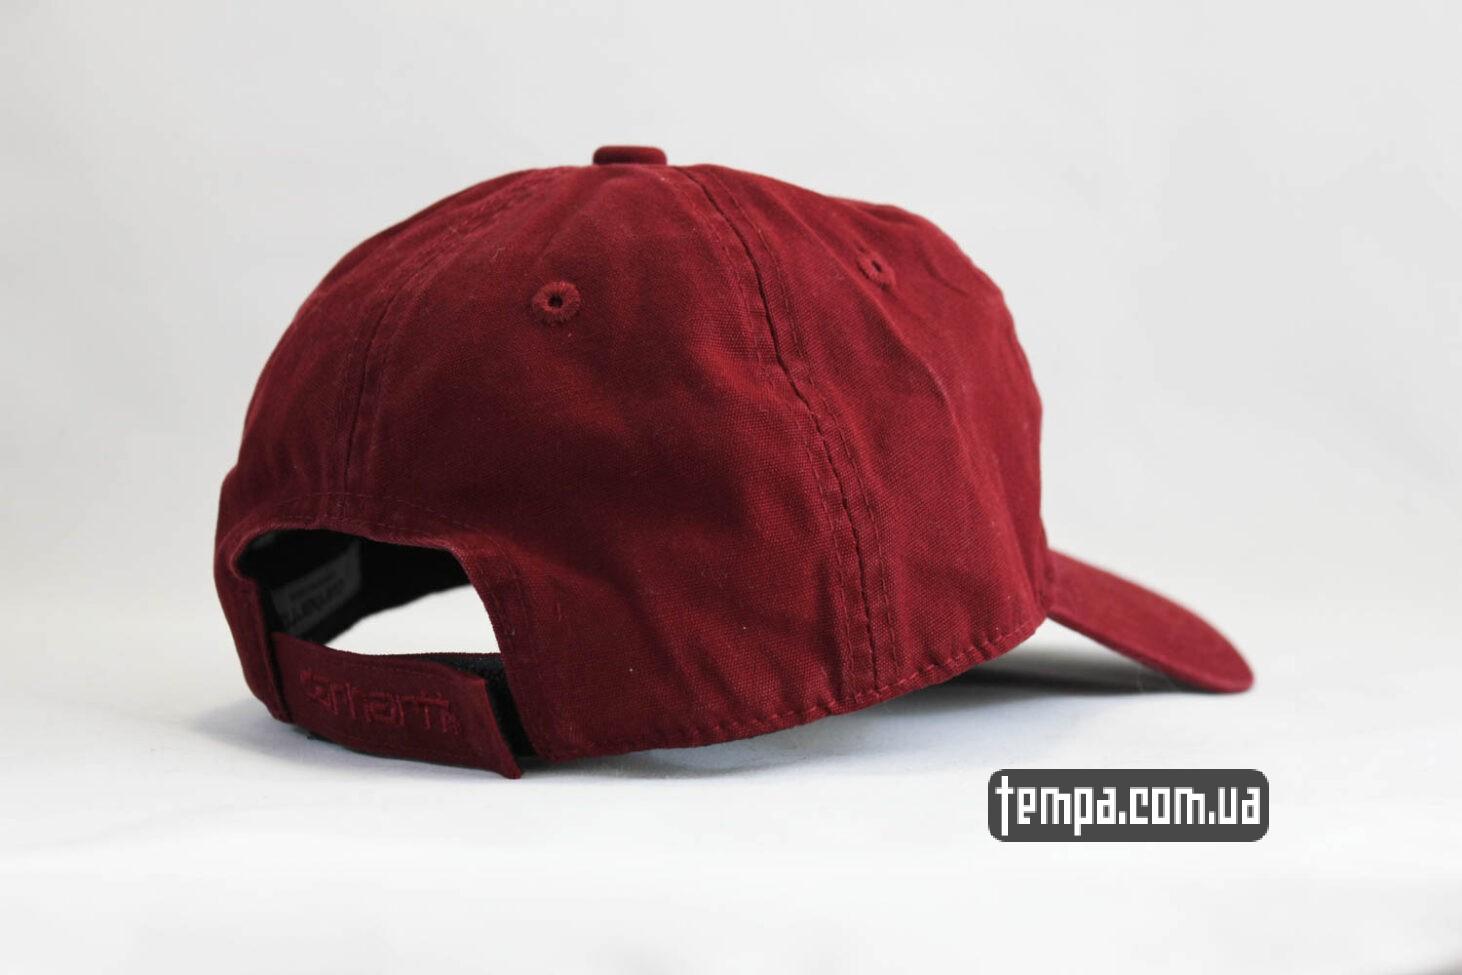 кархарт украина купить кепка бейсболка snapback Carhartt бордовая кожаный логотип